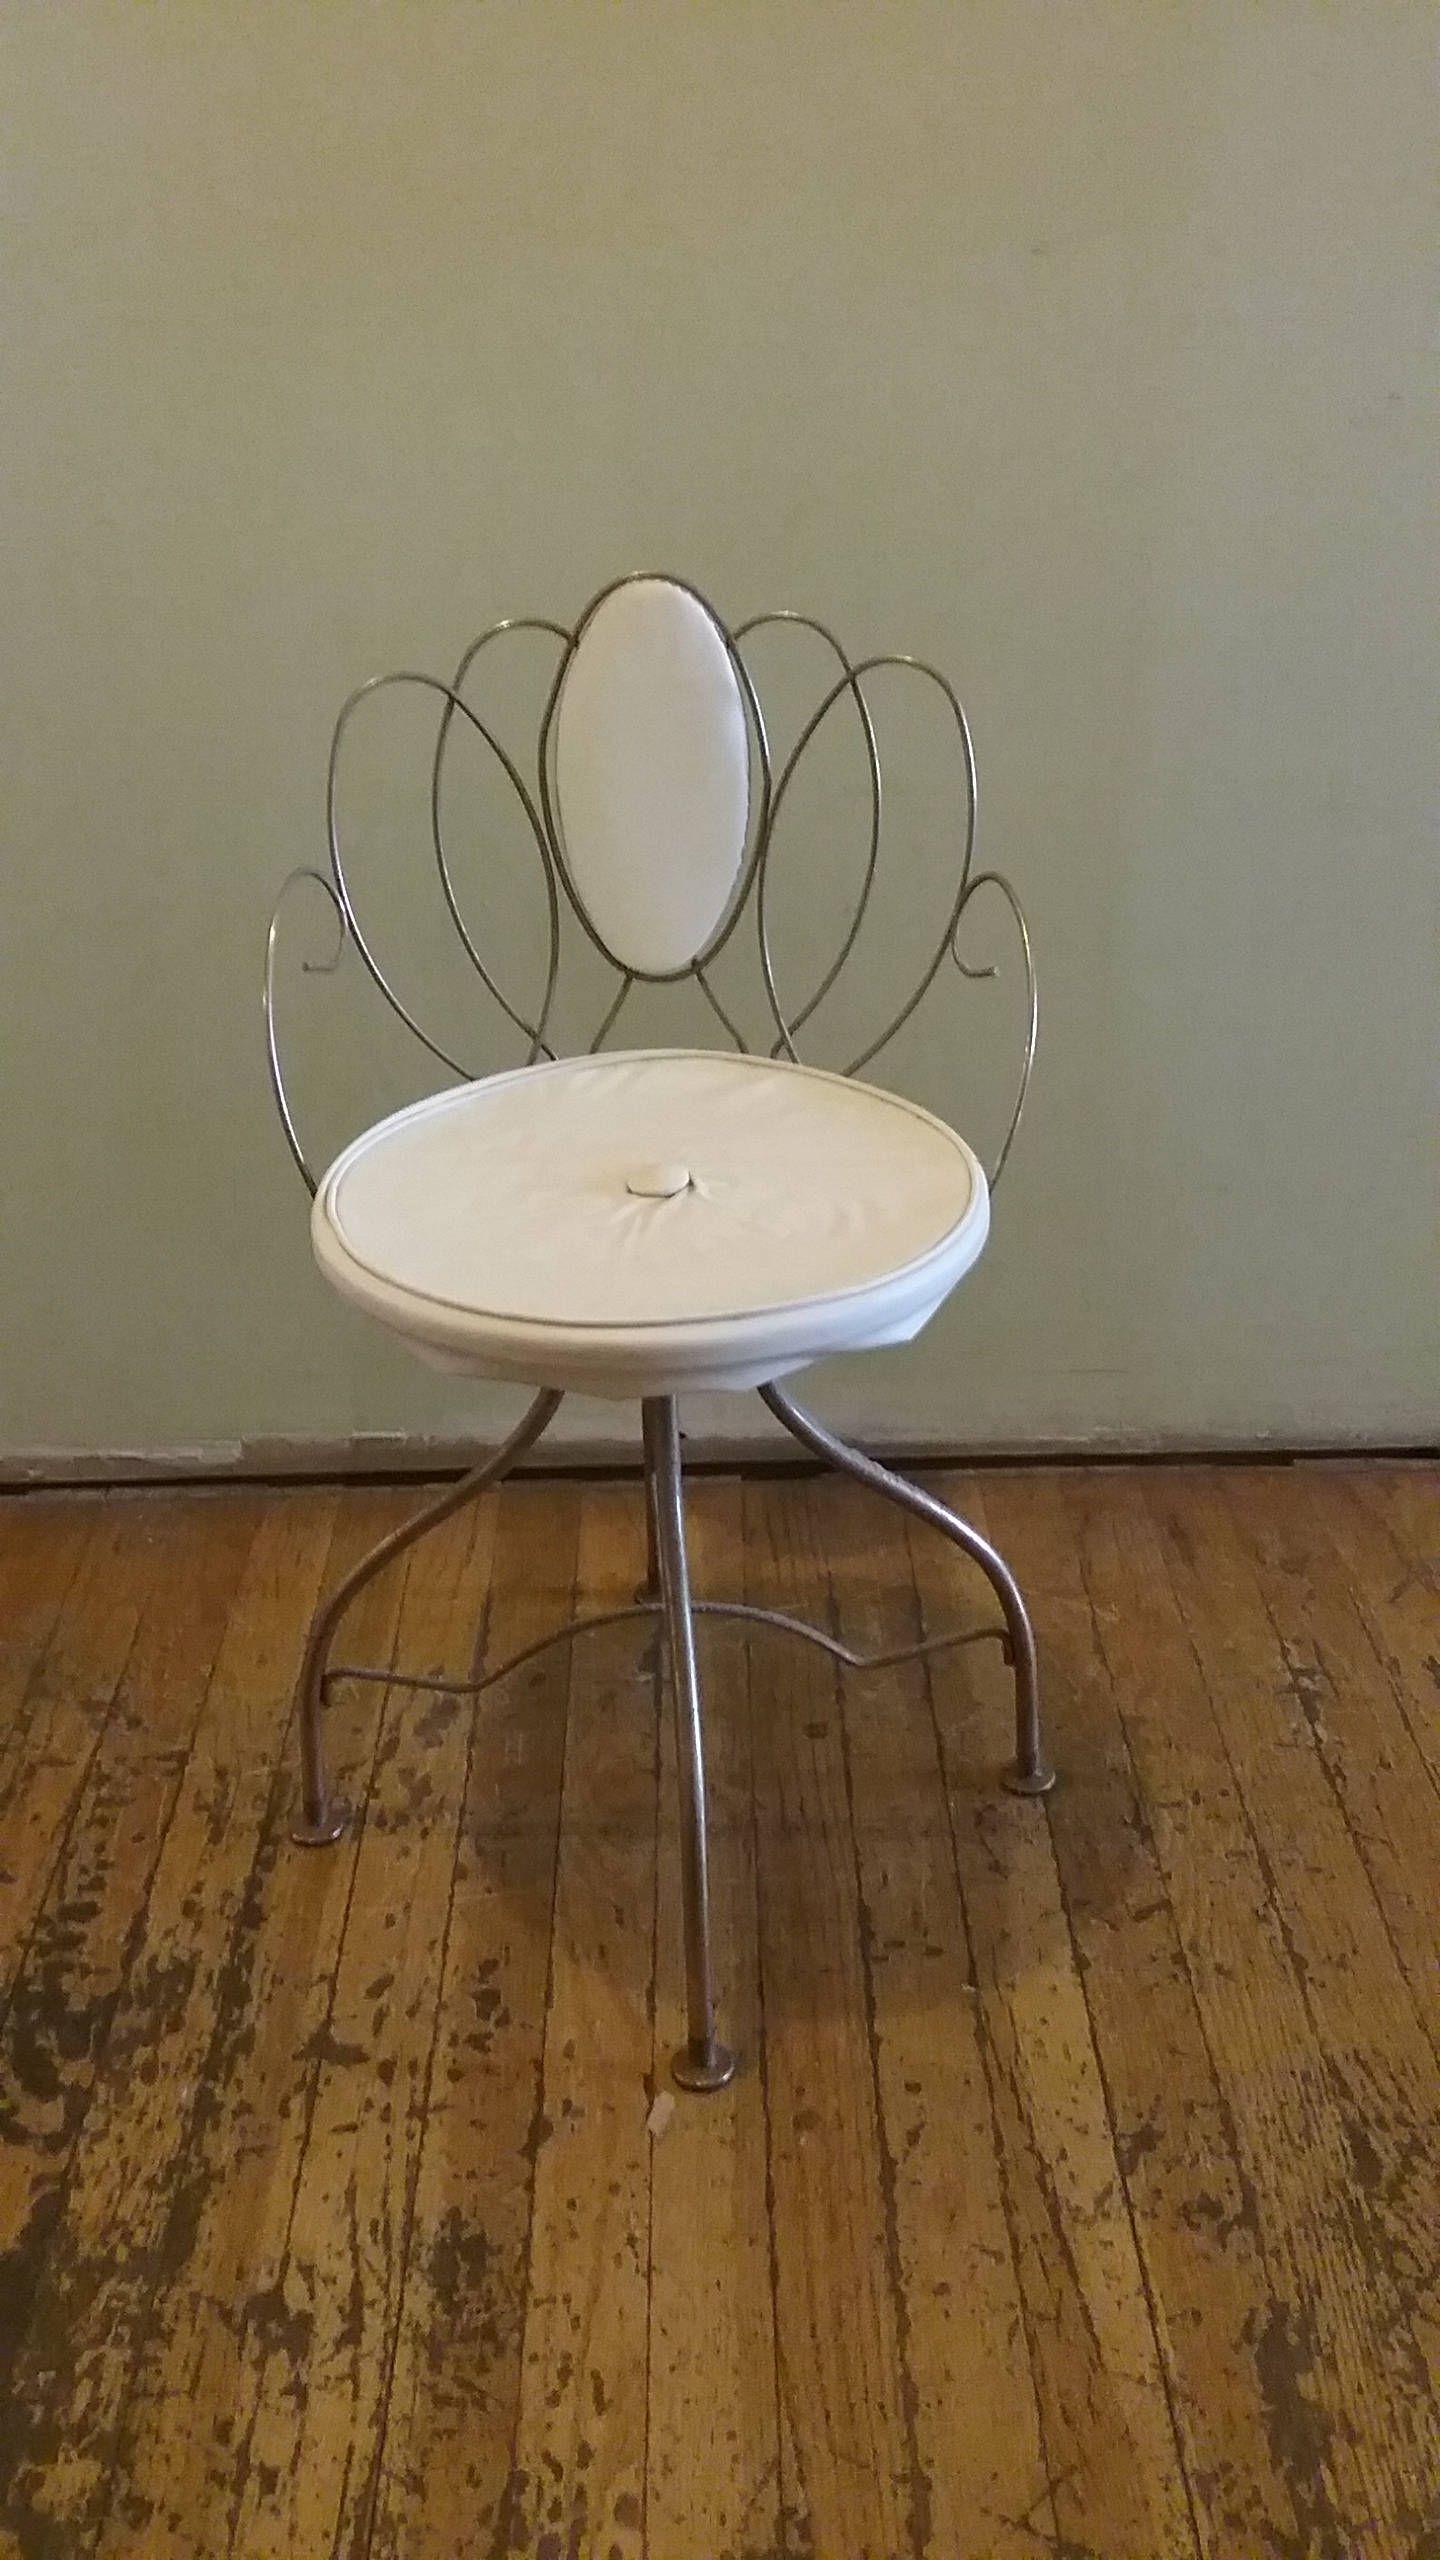 Vintage Vanity Chair, Lakewood Chicago Vintage Metal Chair, Fancy Regarding Famous Spin Rotating Coffee Tables (Gallery 12 of 20)